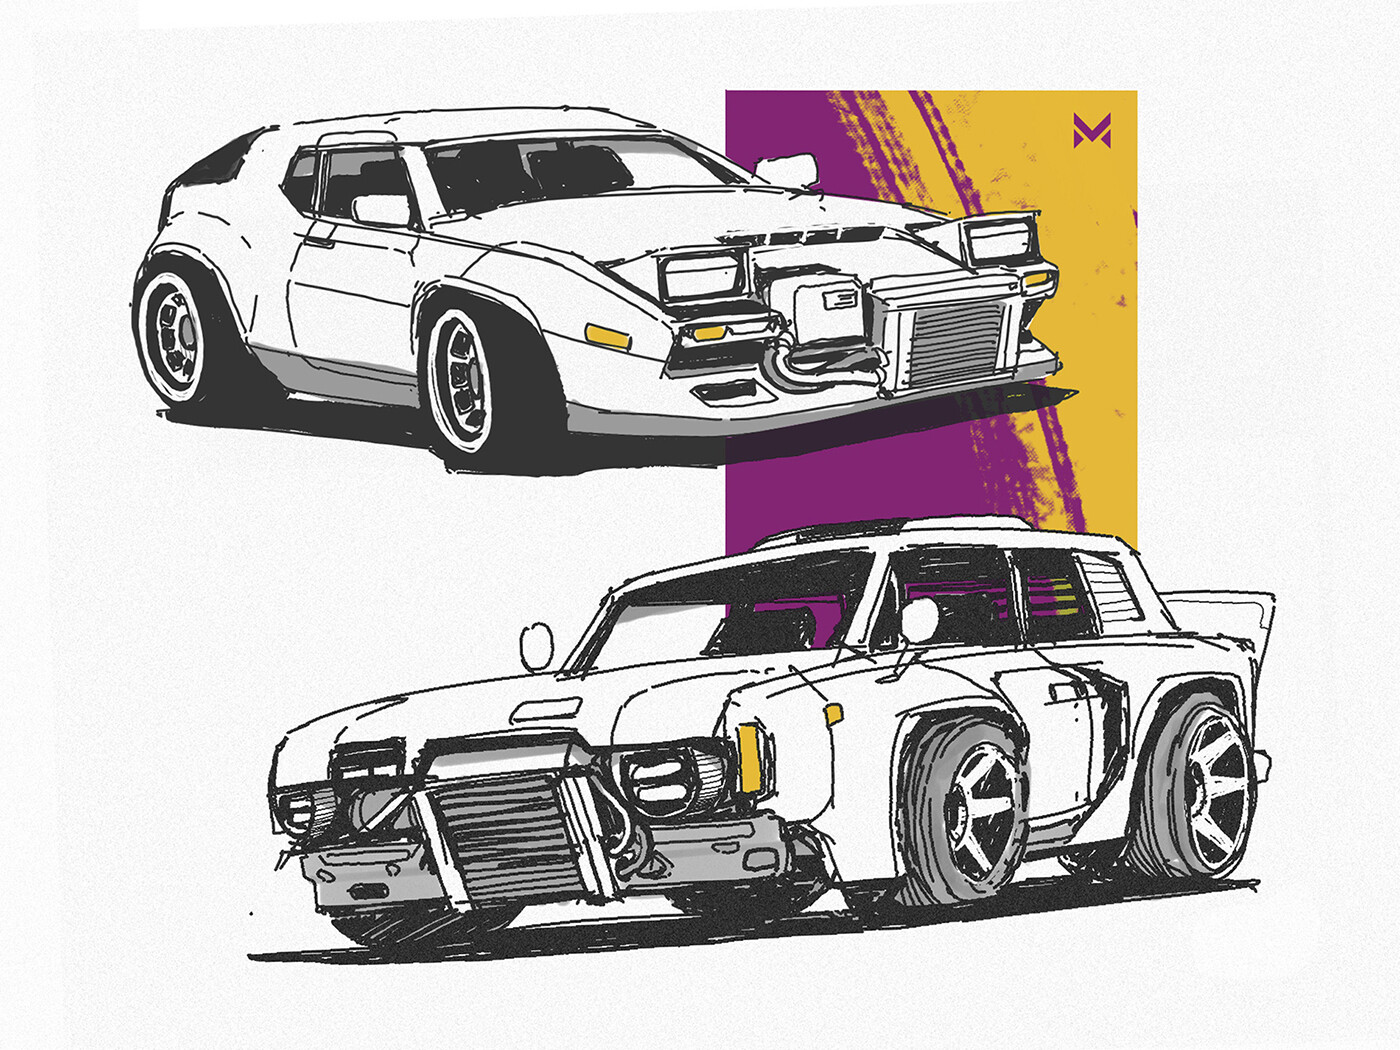 JDM tuner car concepts